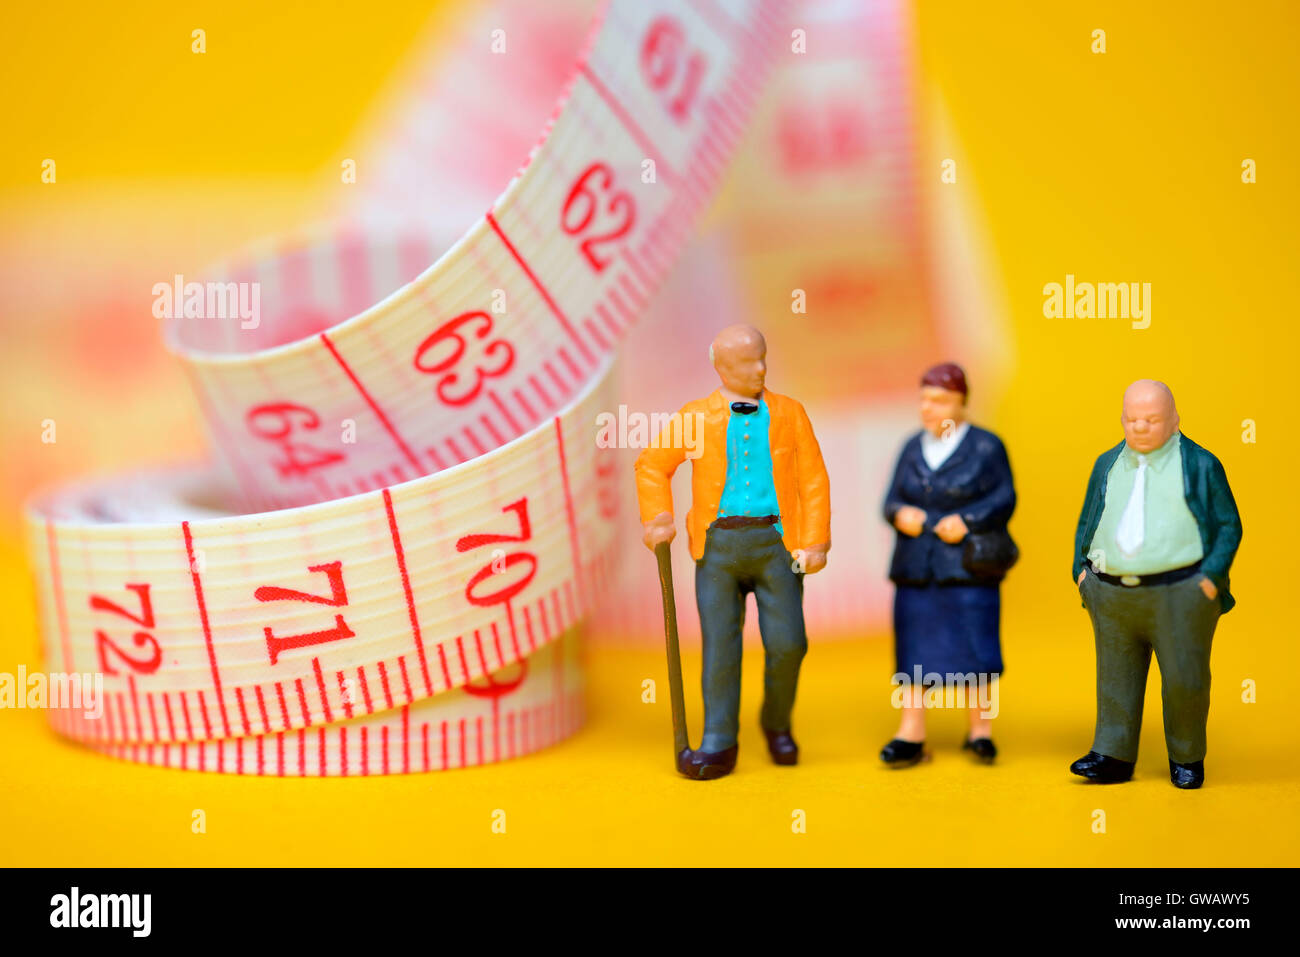 Senior citizens and dimension tape, symbolic photo Flexi pension, Senioren und Massband, Symbolfoto Flexi-Rente Stock Photo